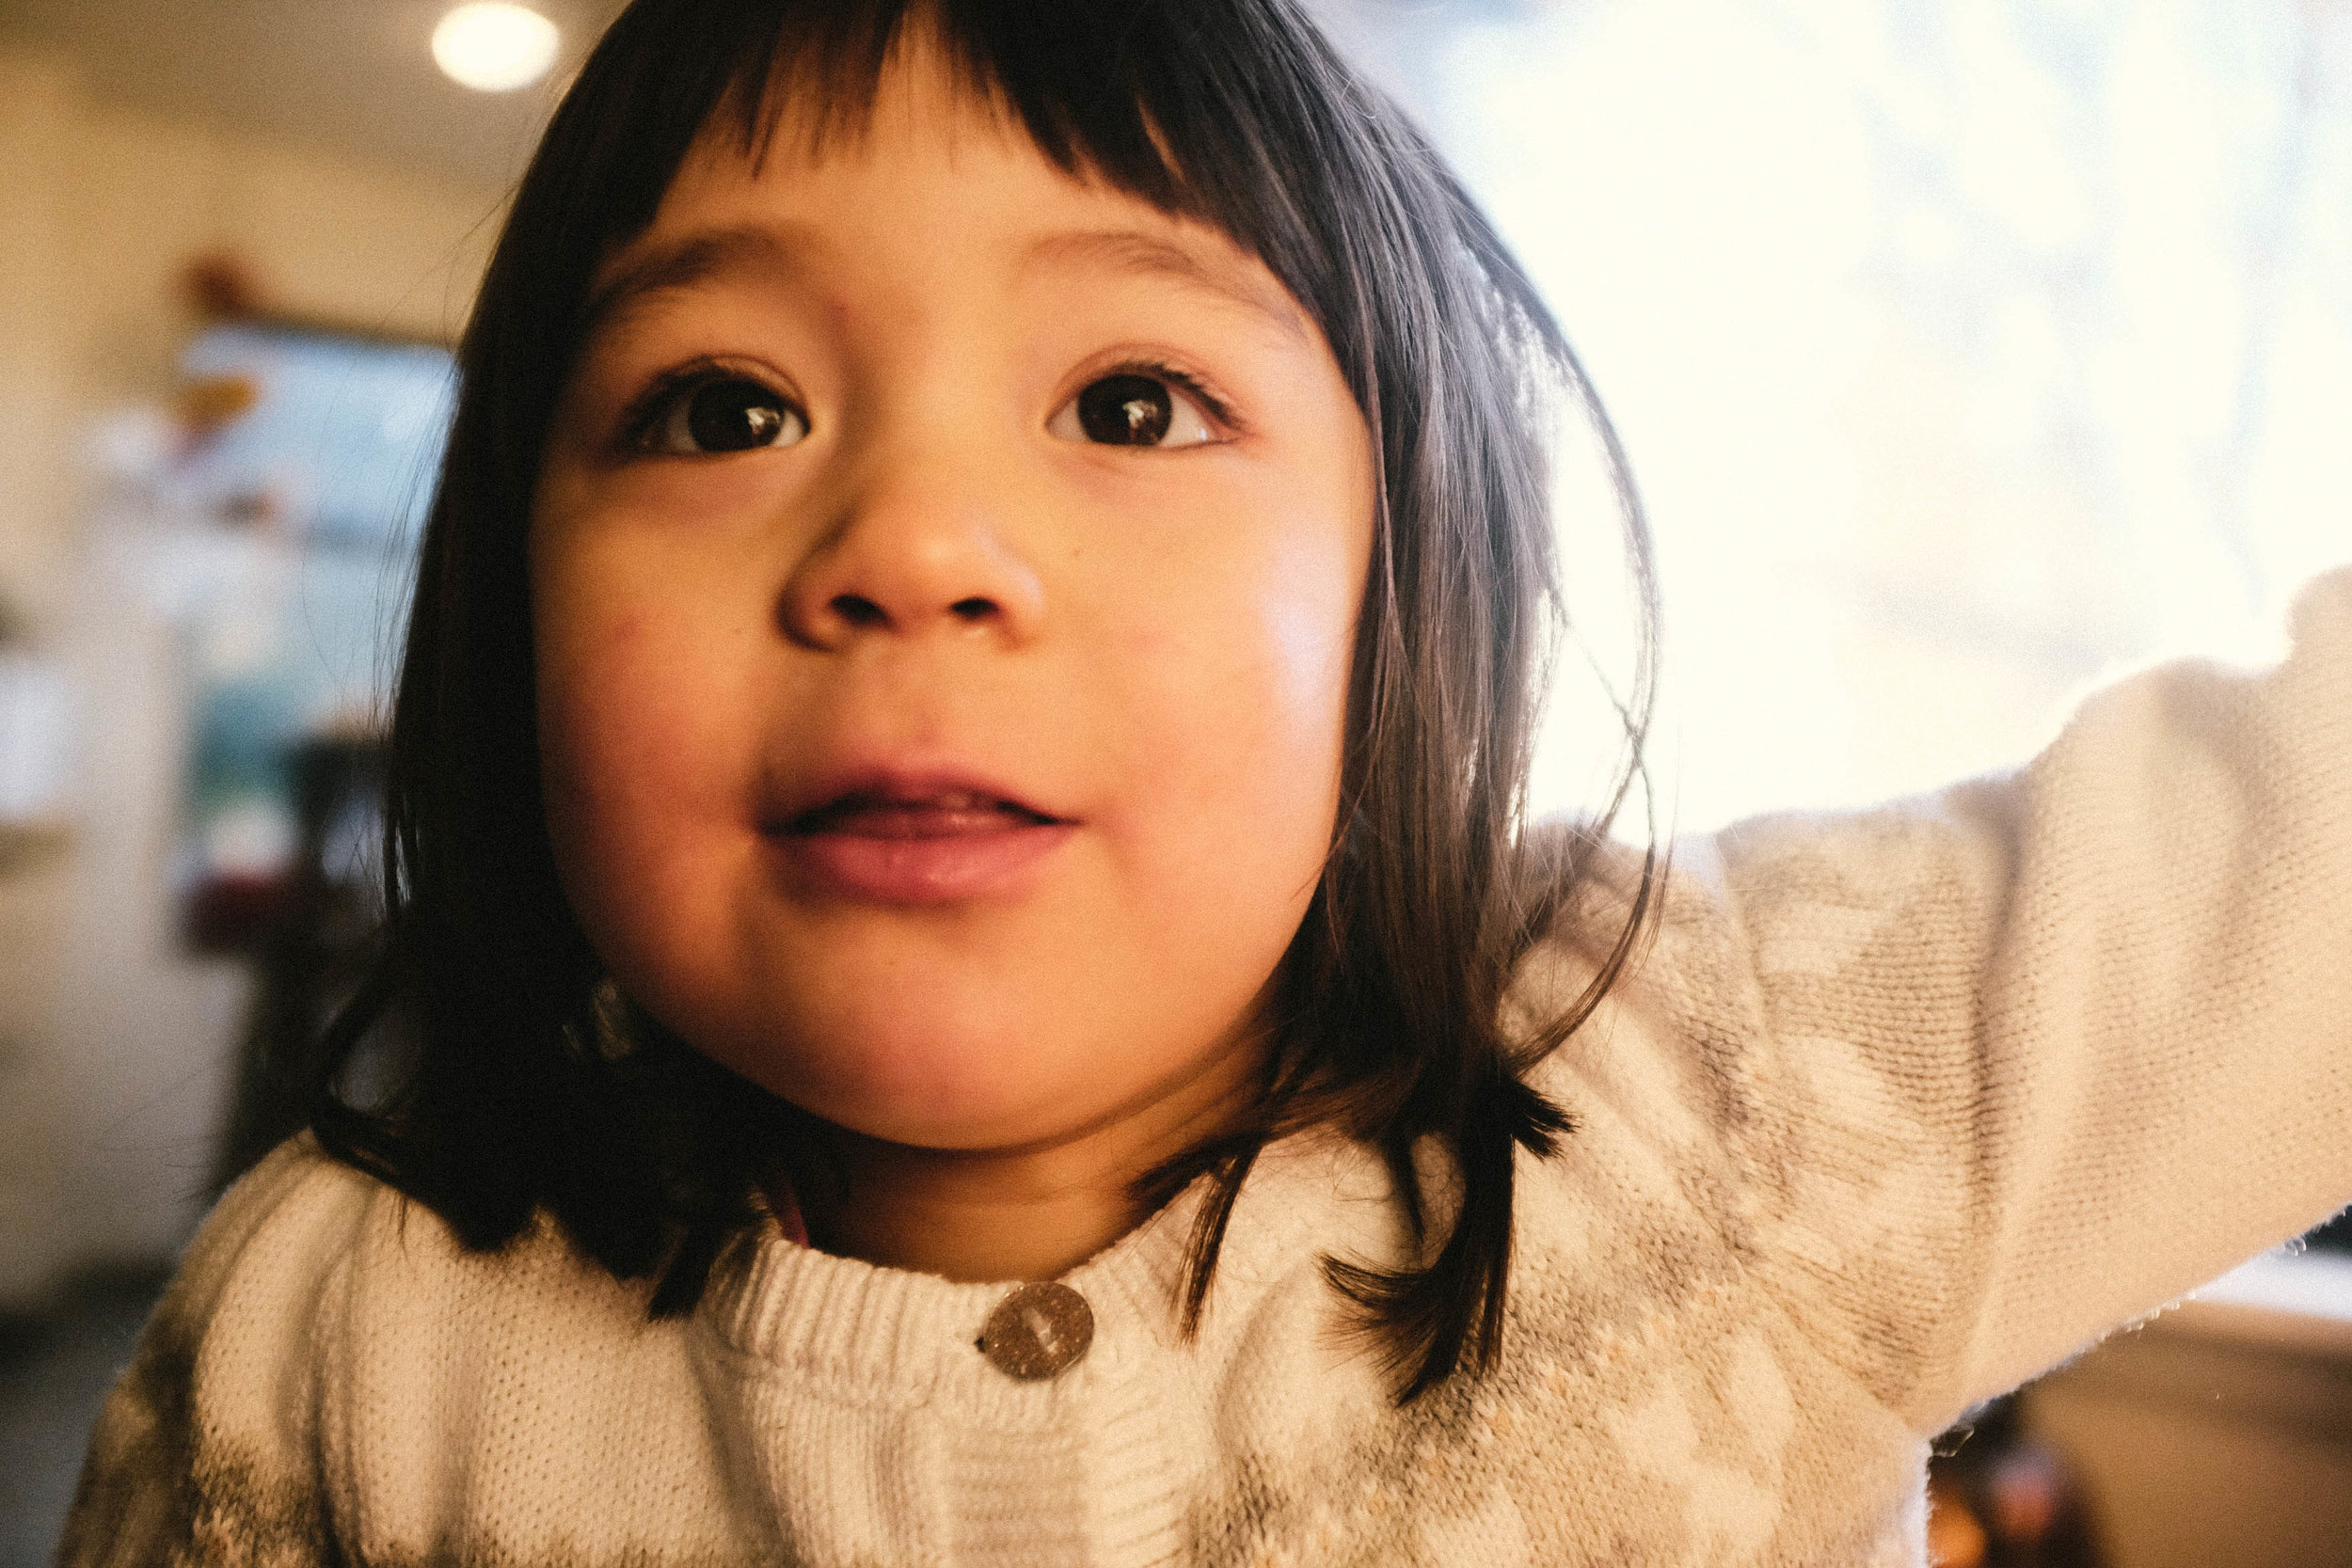 Korean girl photograph seattle